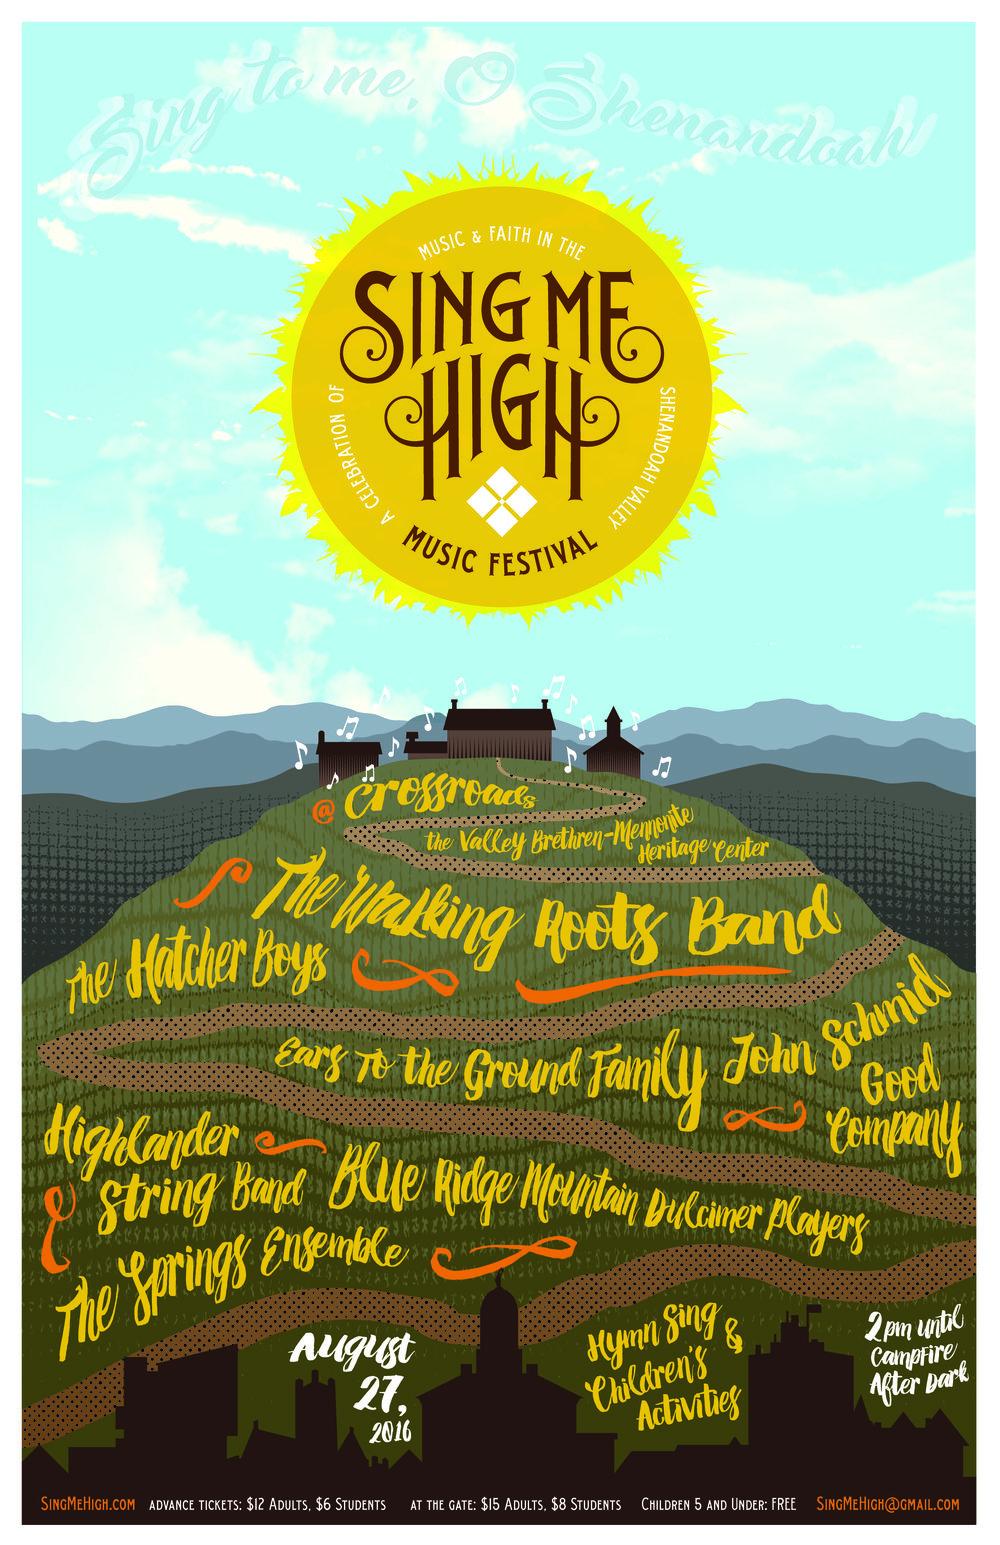 Sing Me High Poster FINAL.jpg